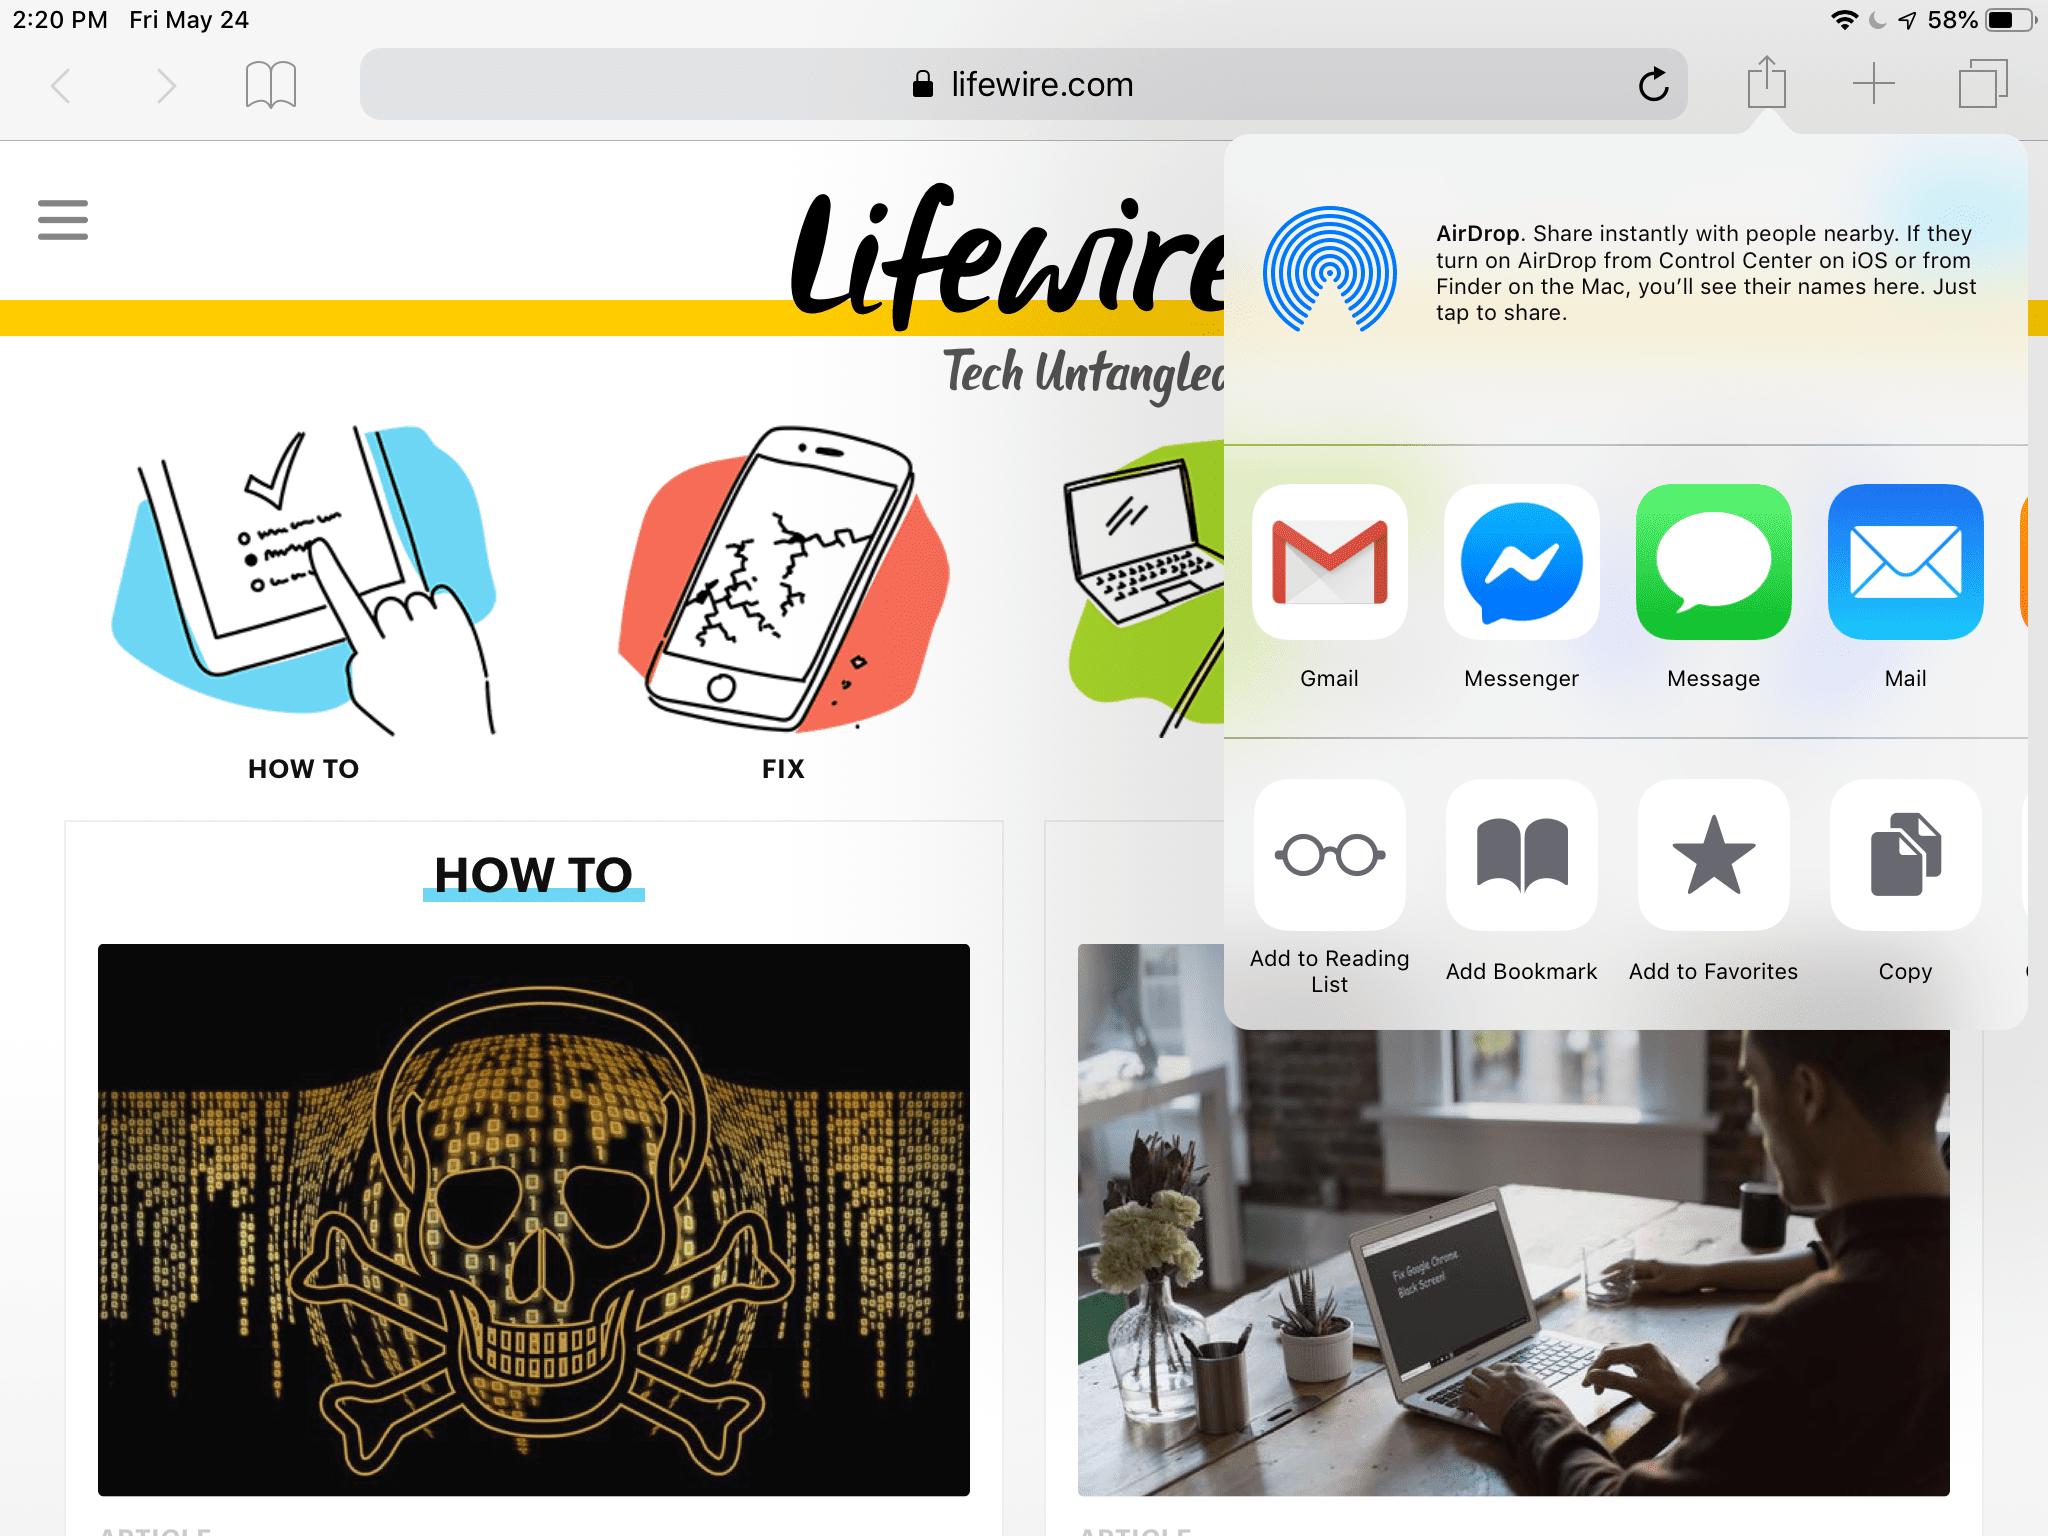 how do you edit favorites in safari on ipad